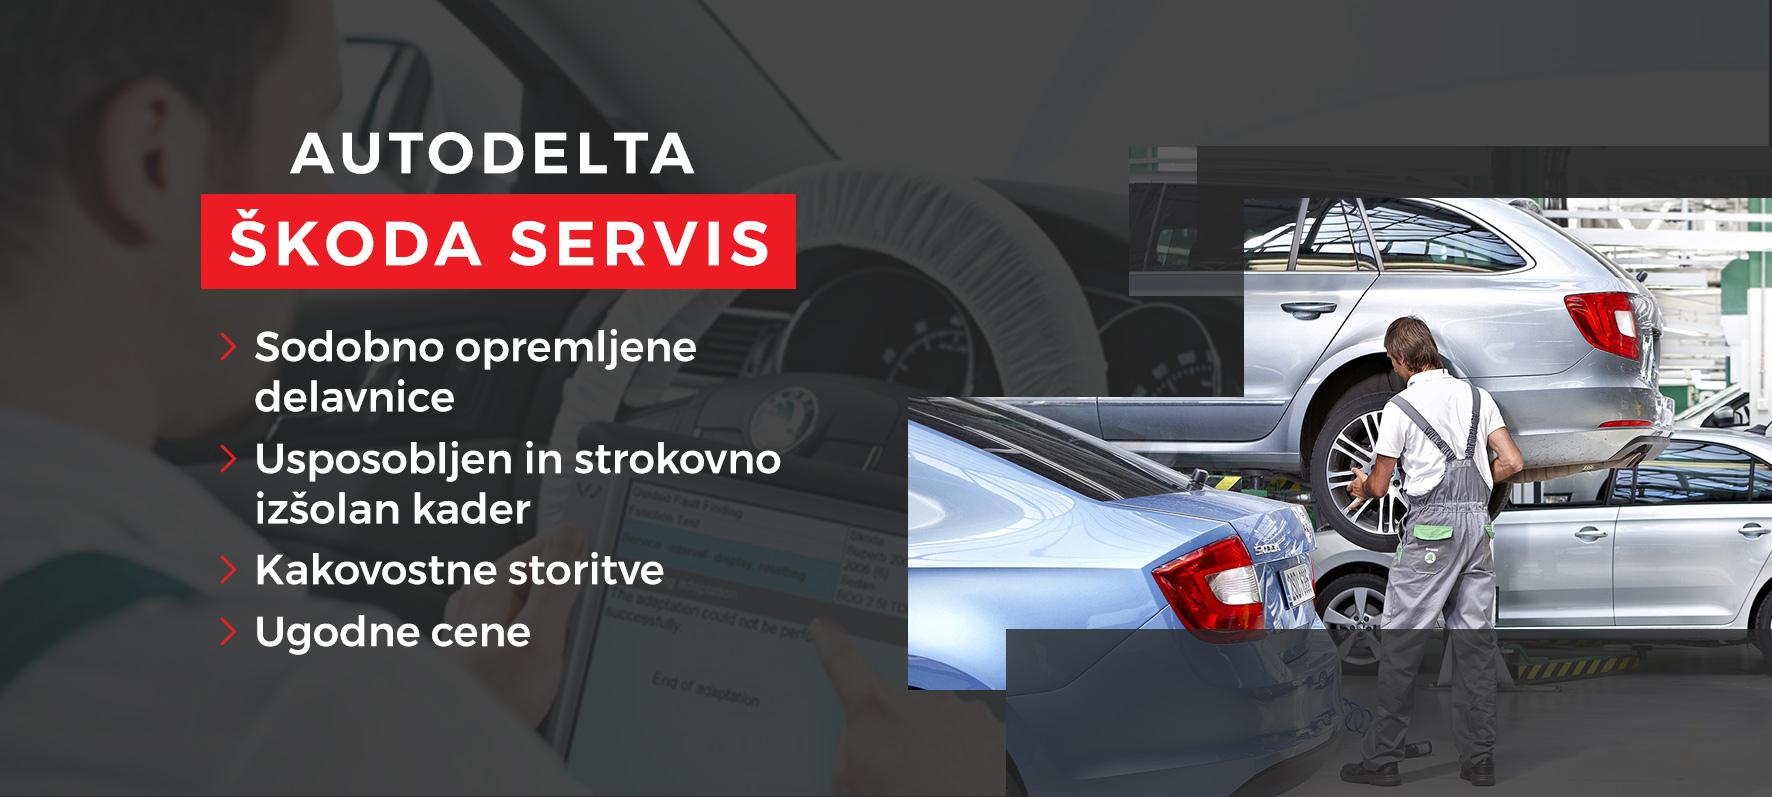 Škoda servis Autodelta Ljubljana